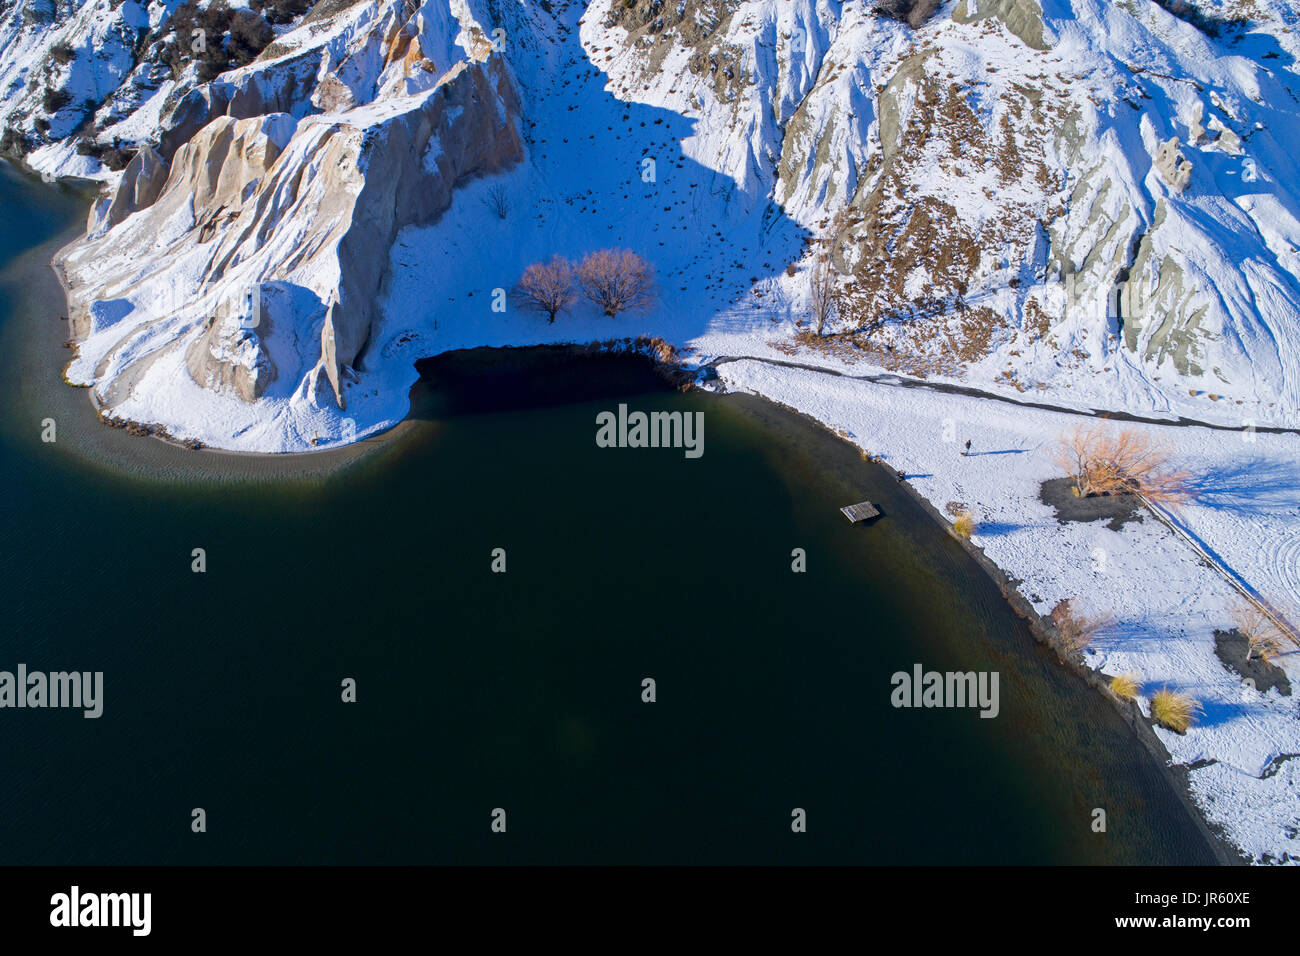 Blue Lake, St Bathans, Maniototo, Central Otago, Südinsel, Neuseeland - Drohne Luftbild Stockbild